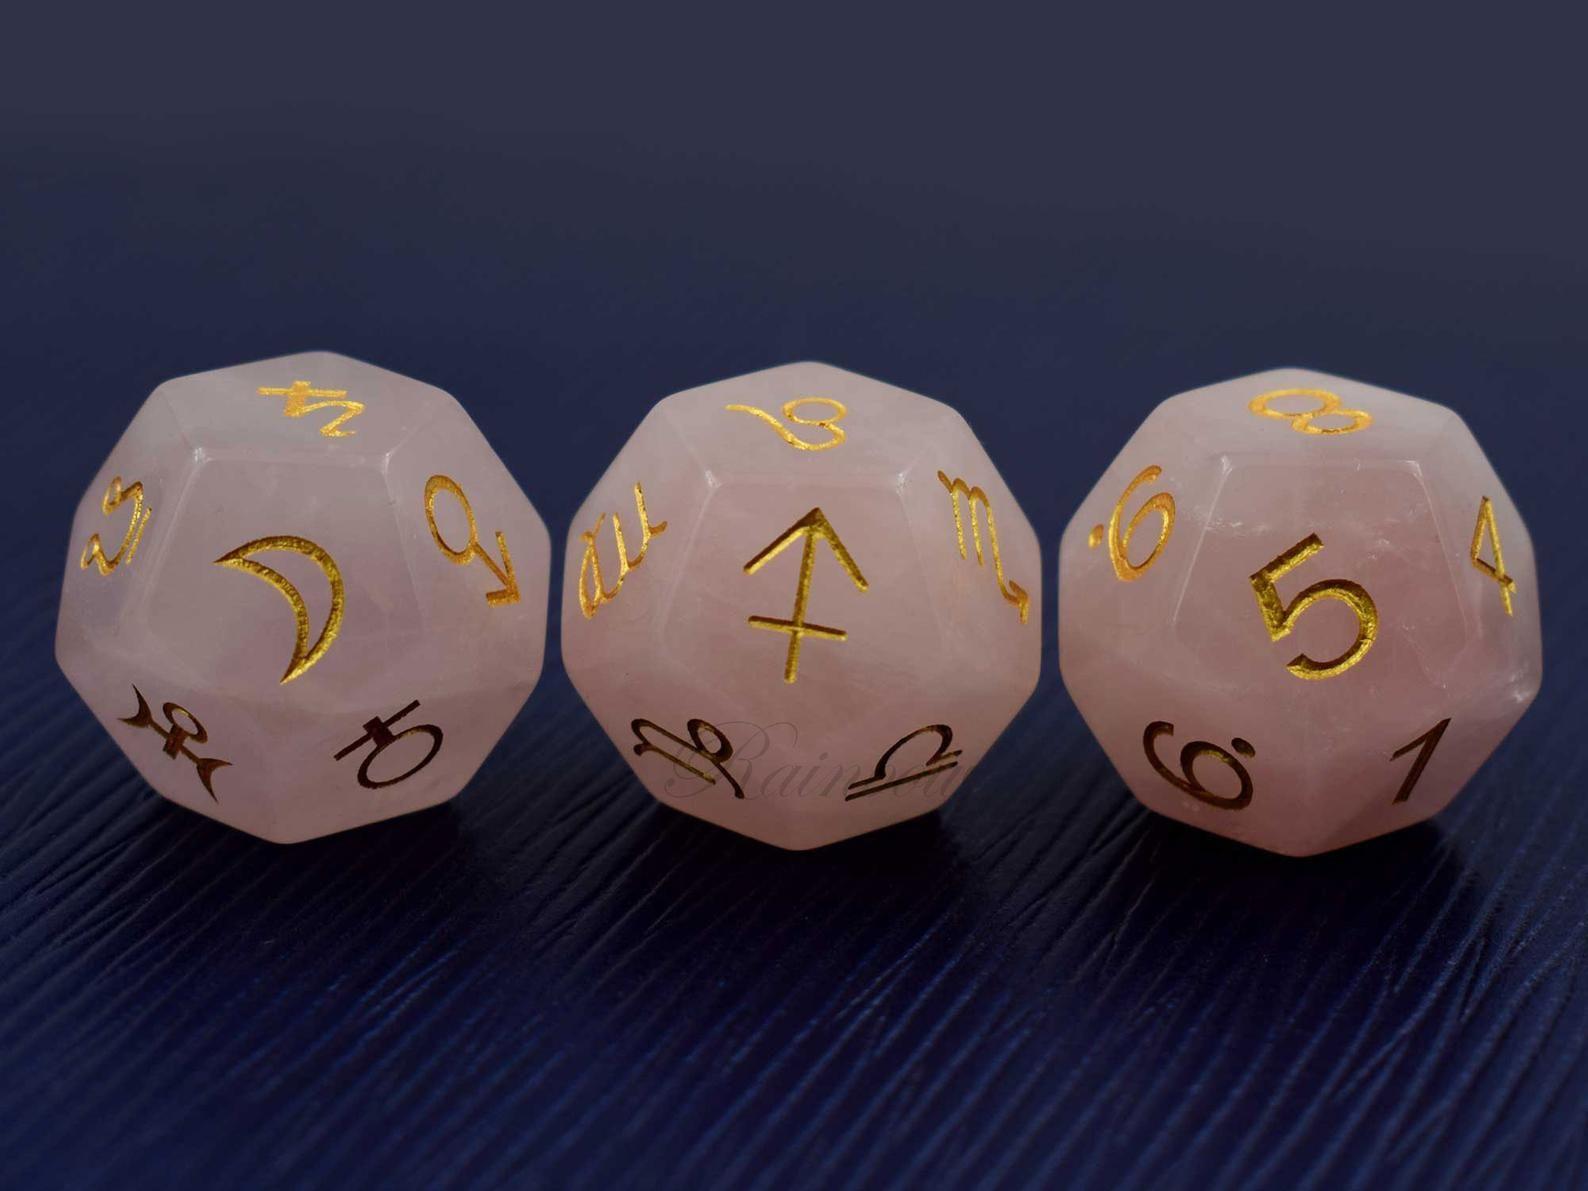 D12 White Quartz Crystal Gem Stone Zodiac Astrology Planets Dice Set Astrodice